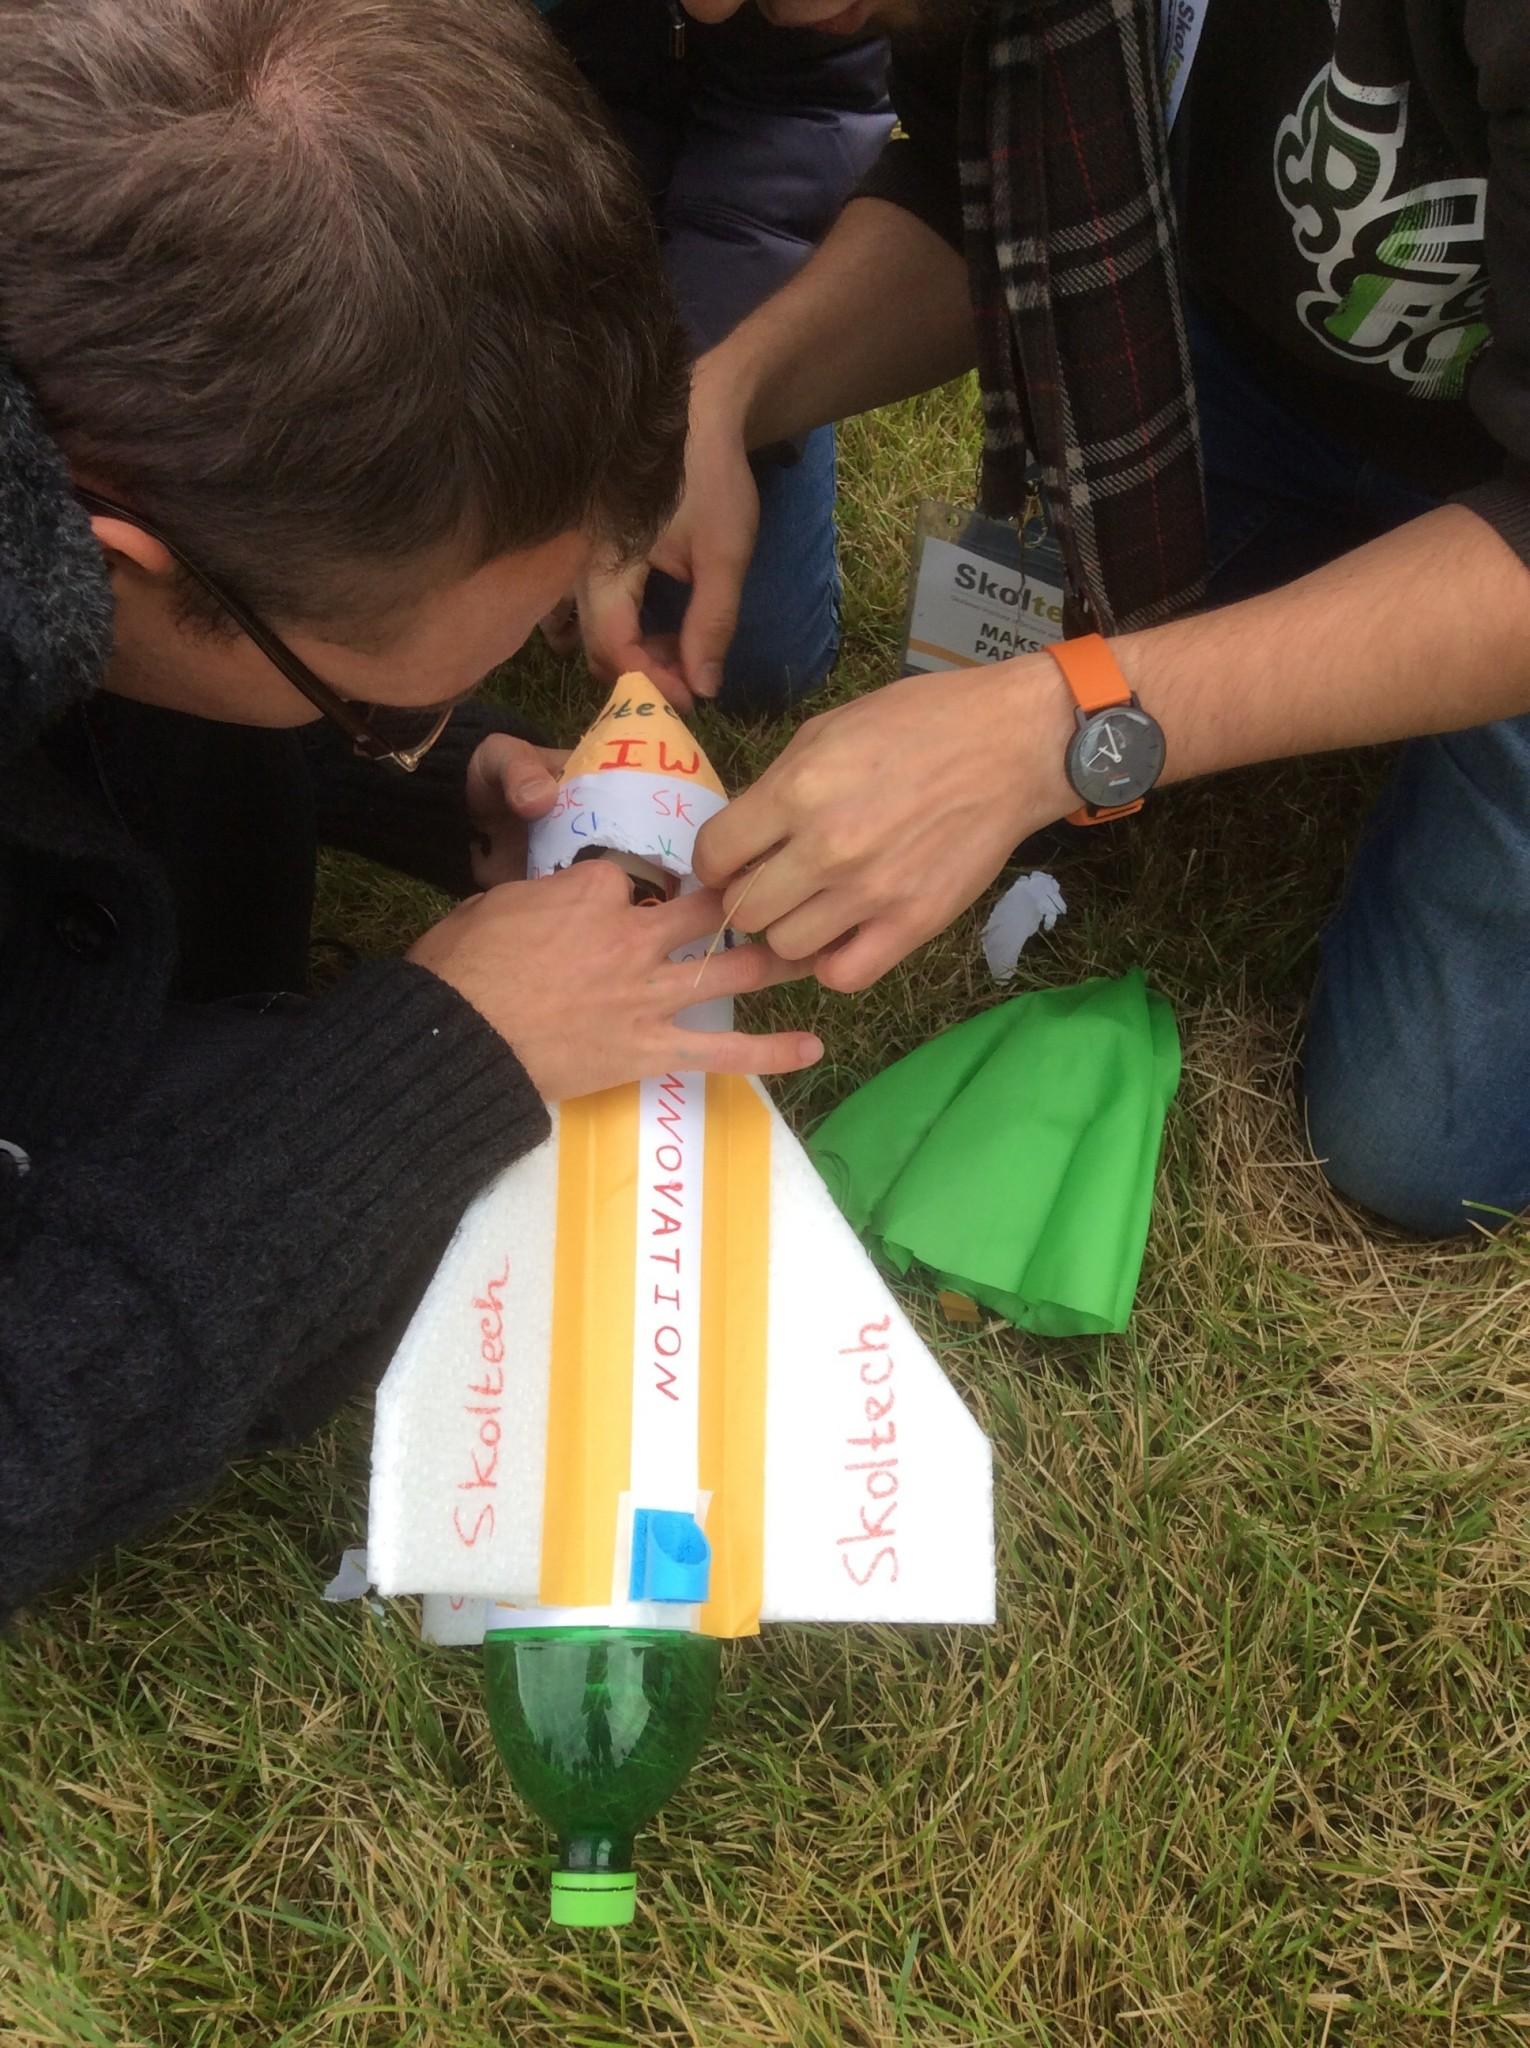 Students work on constructing a miniature rocket. Photo: Skoltech.